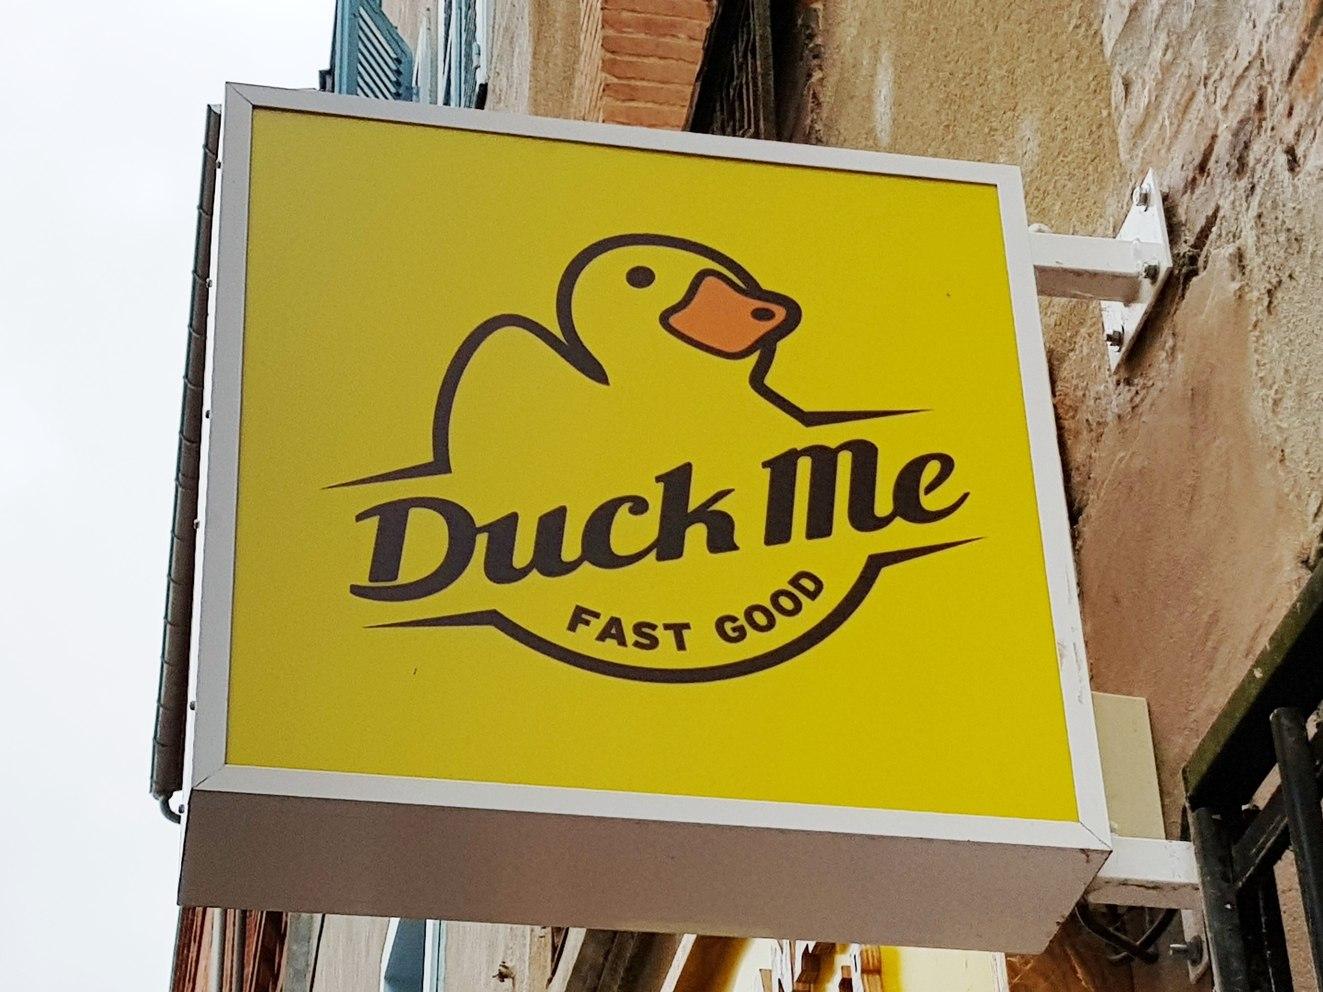 Duck me hard and good - meme